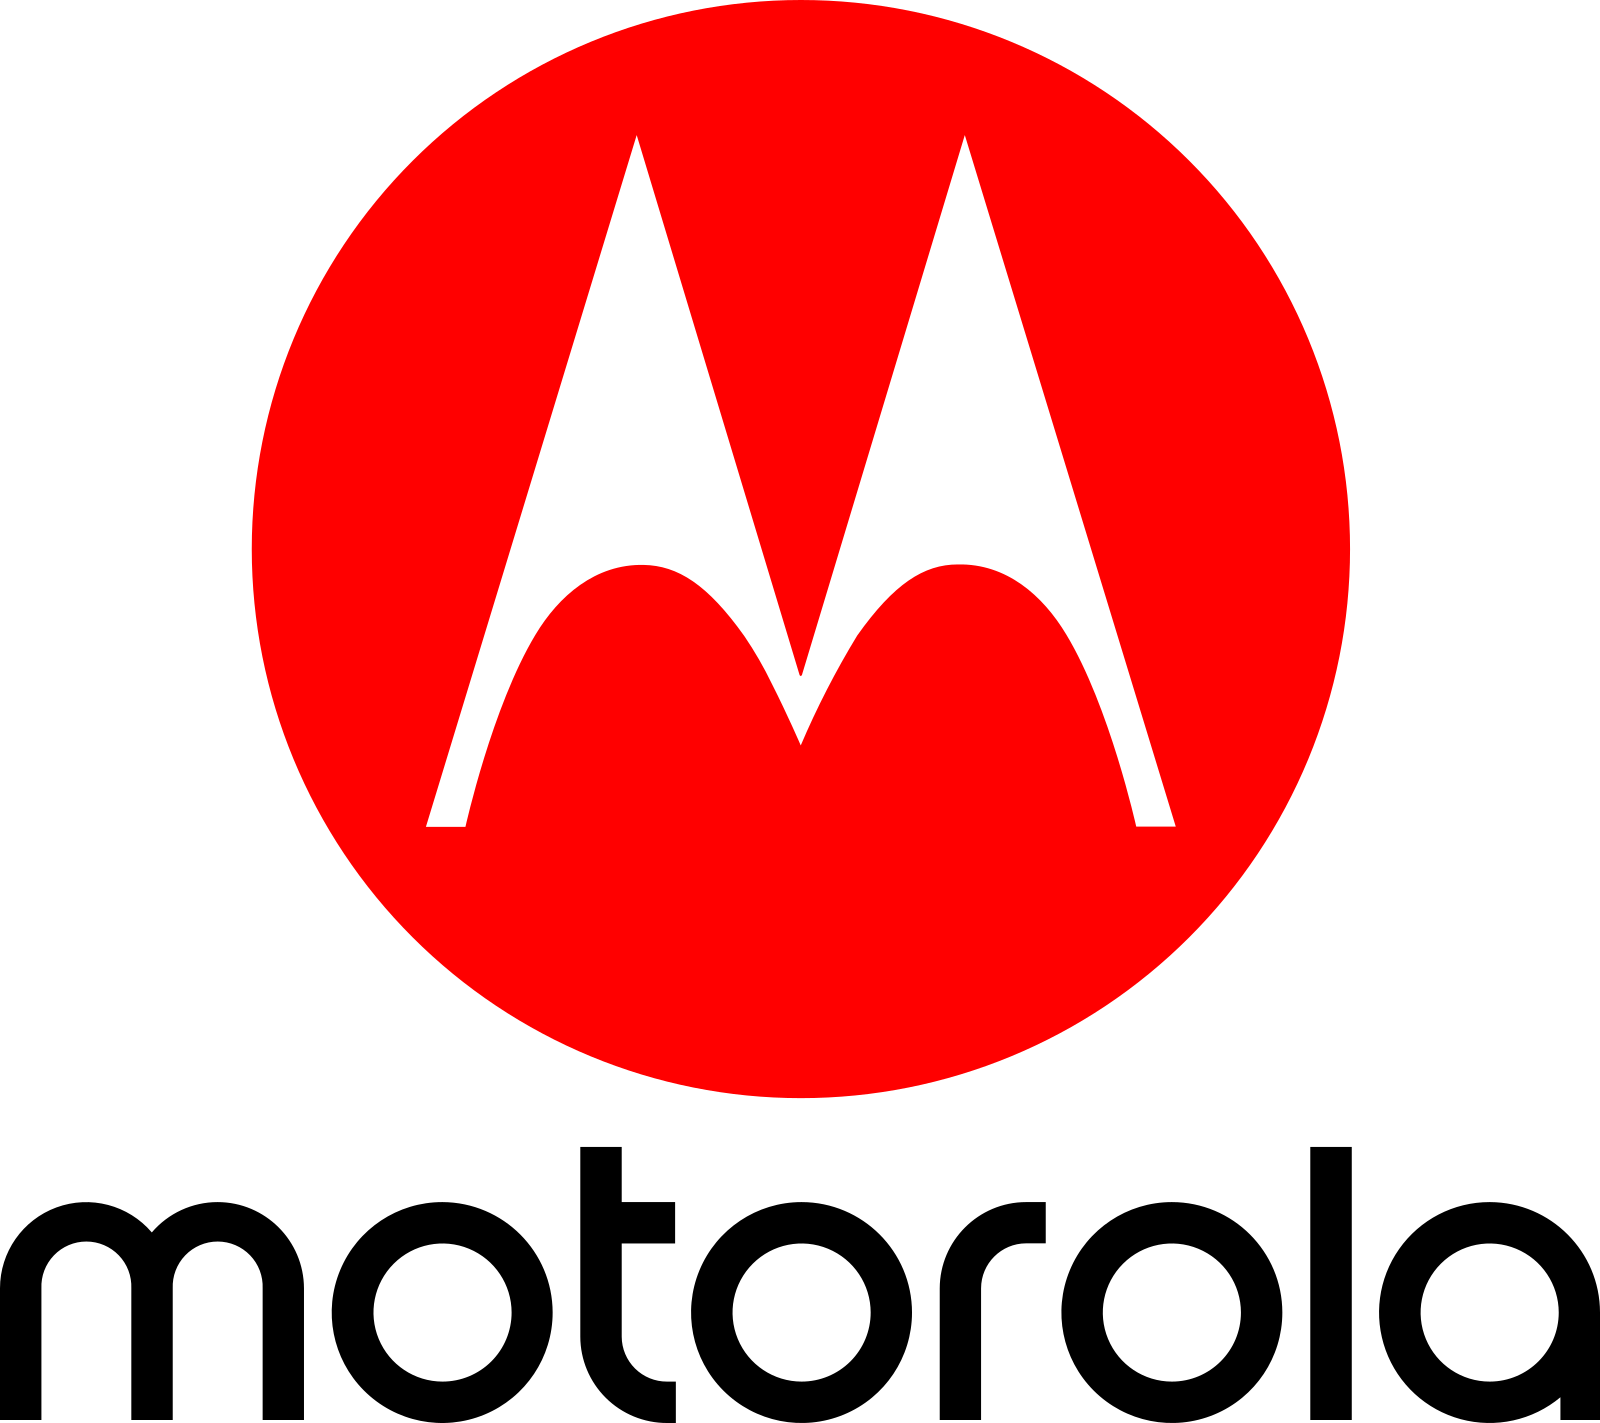 motorola logo 3 1 - Motorola Logo